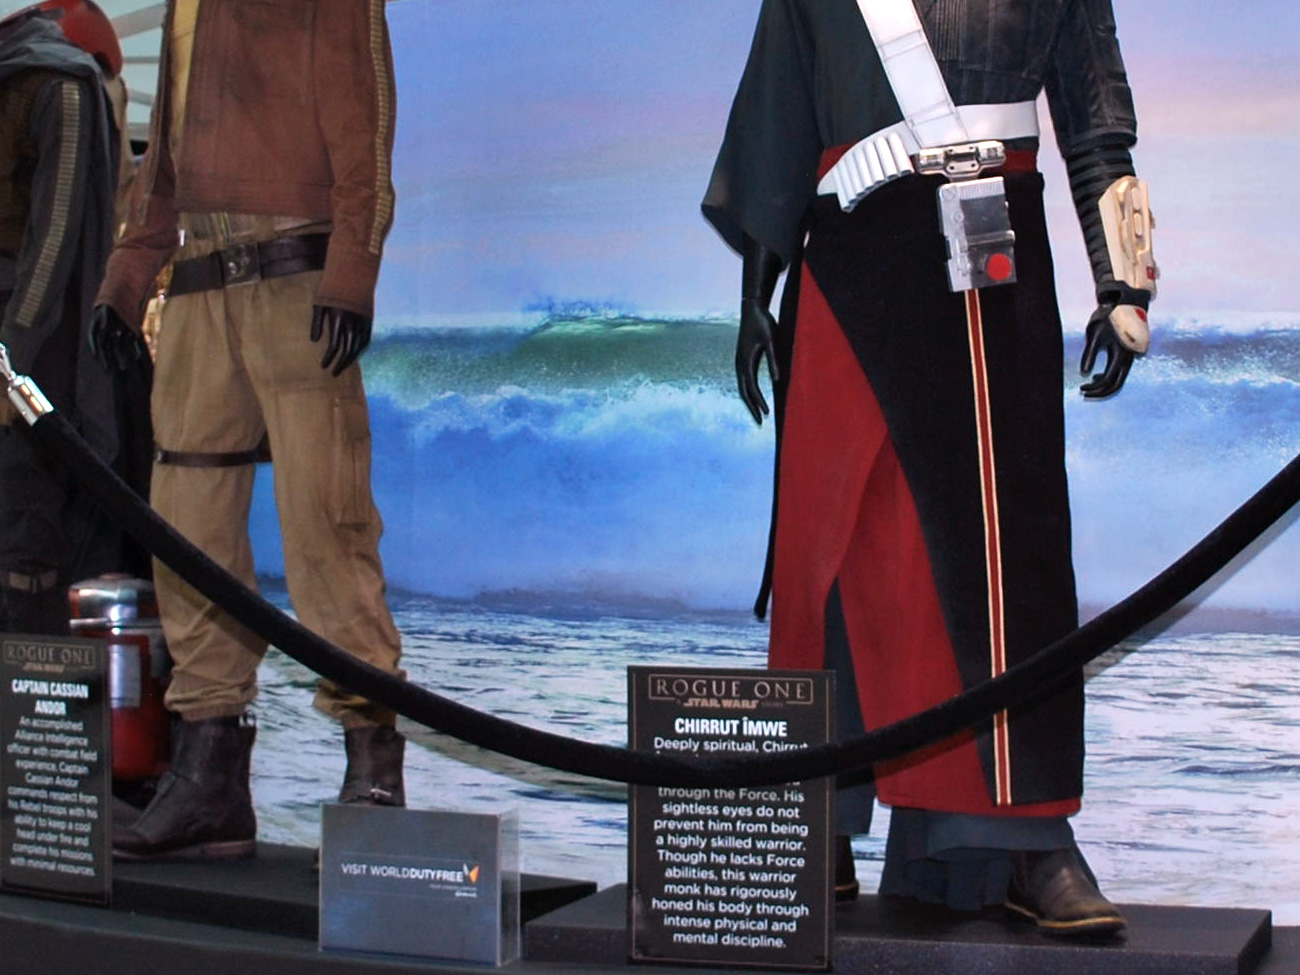 Starwars costumes at Gatwick